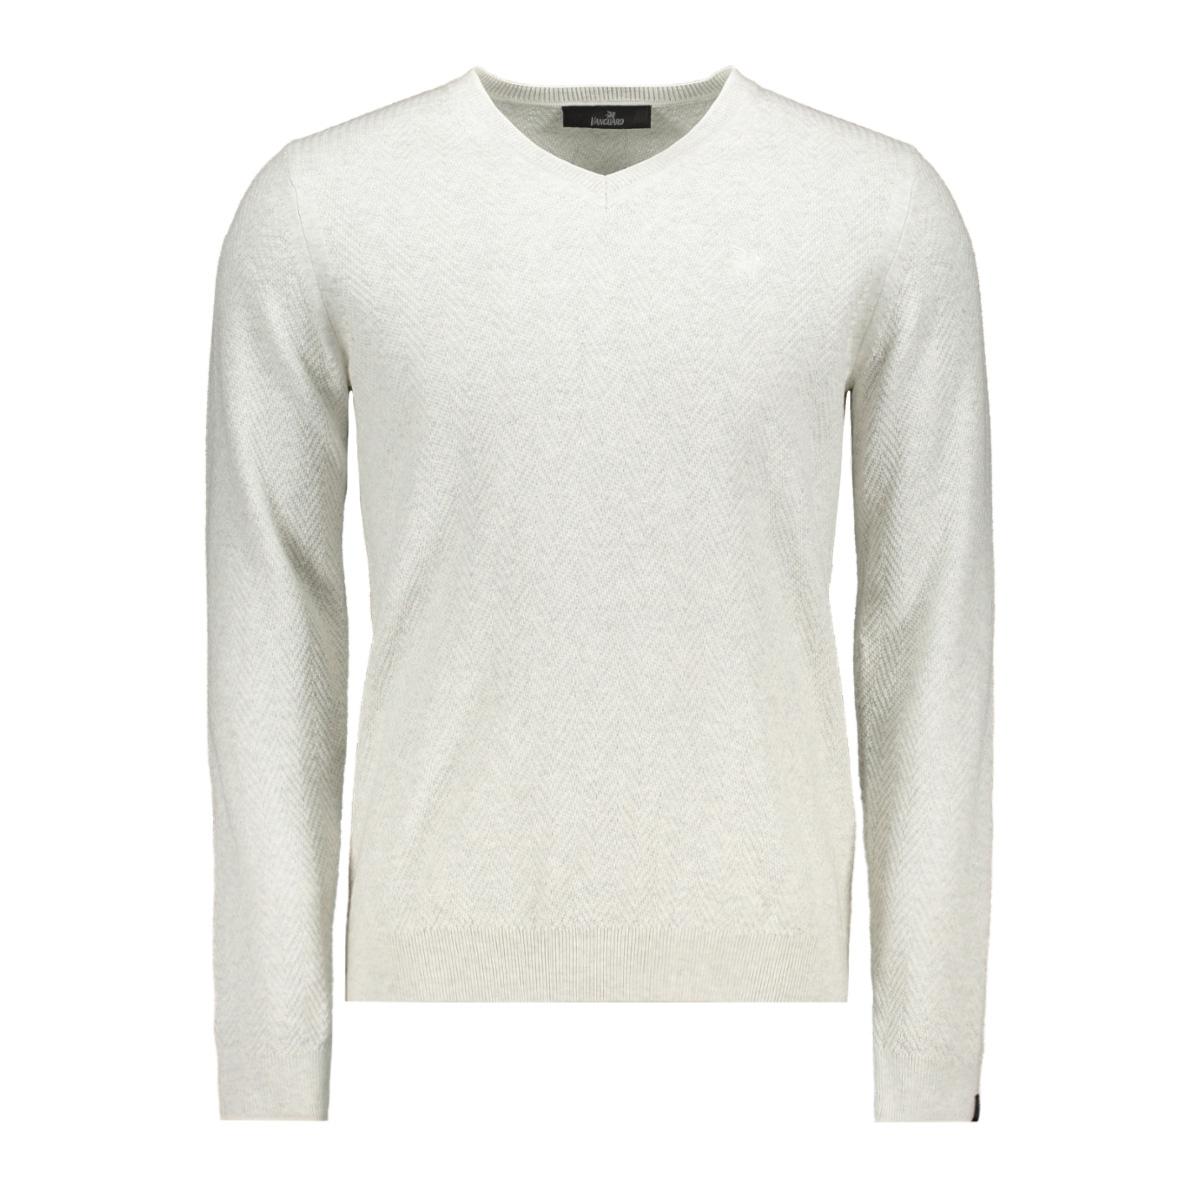 v-neck pullover vkw197130 vanguard trui 910